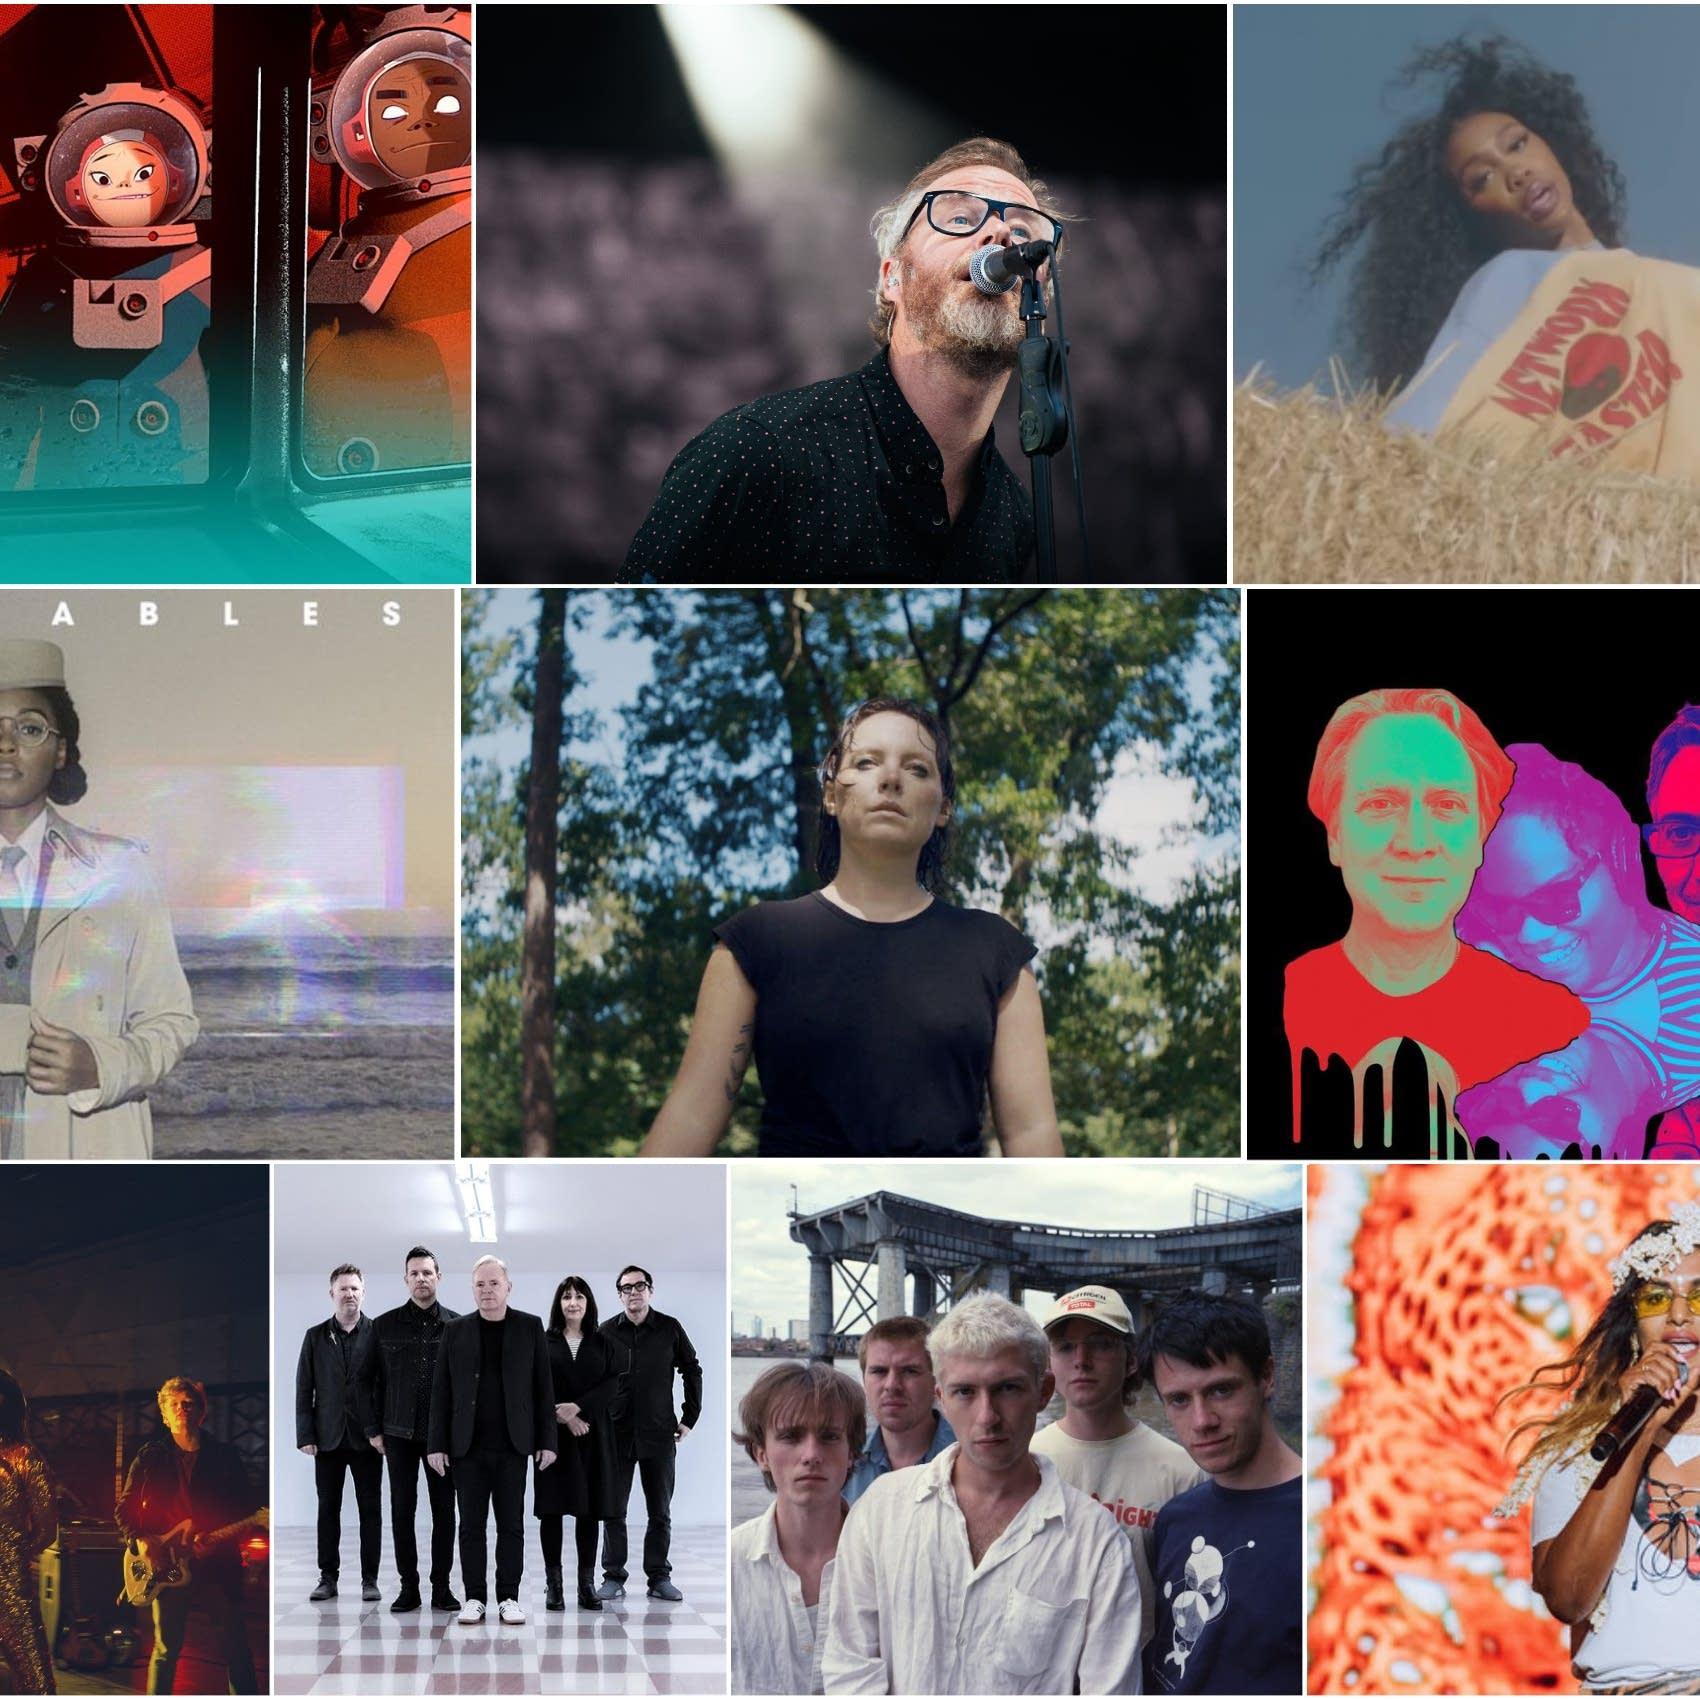 New music collage for September 2020